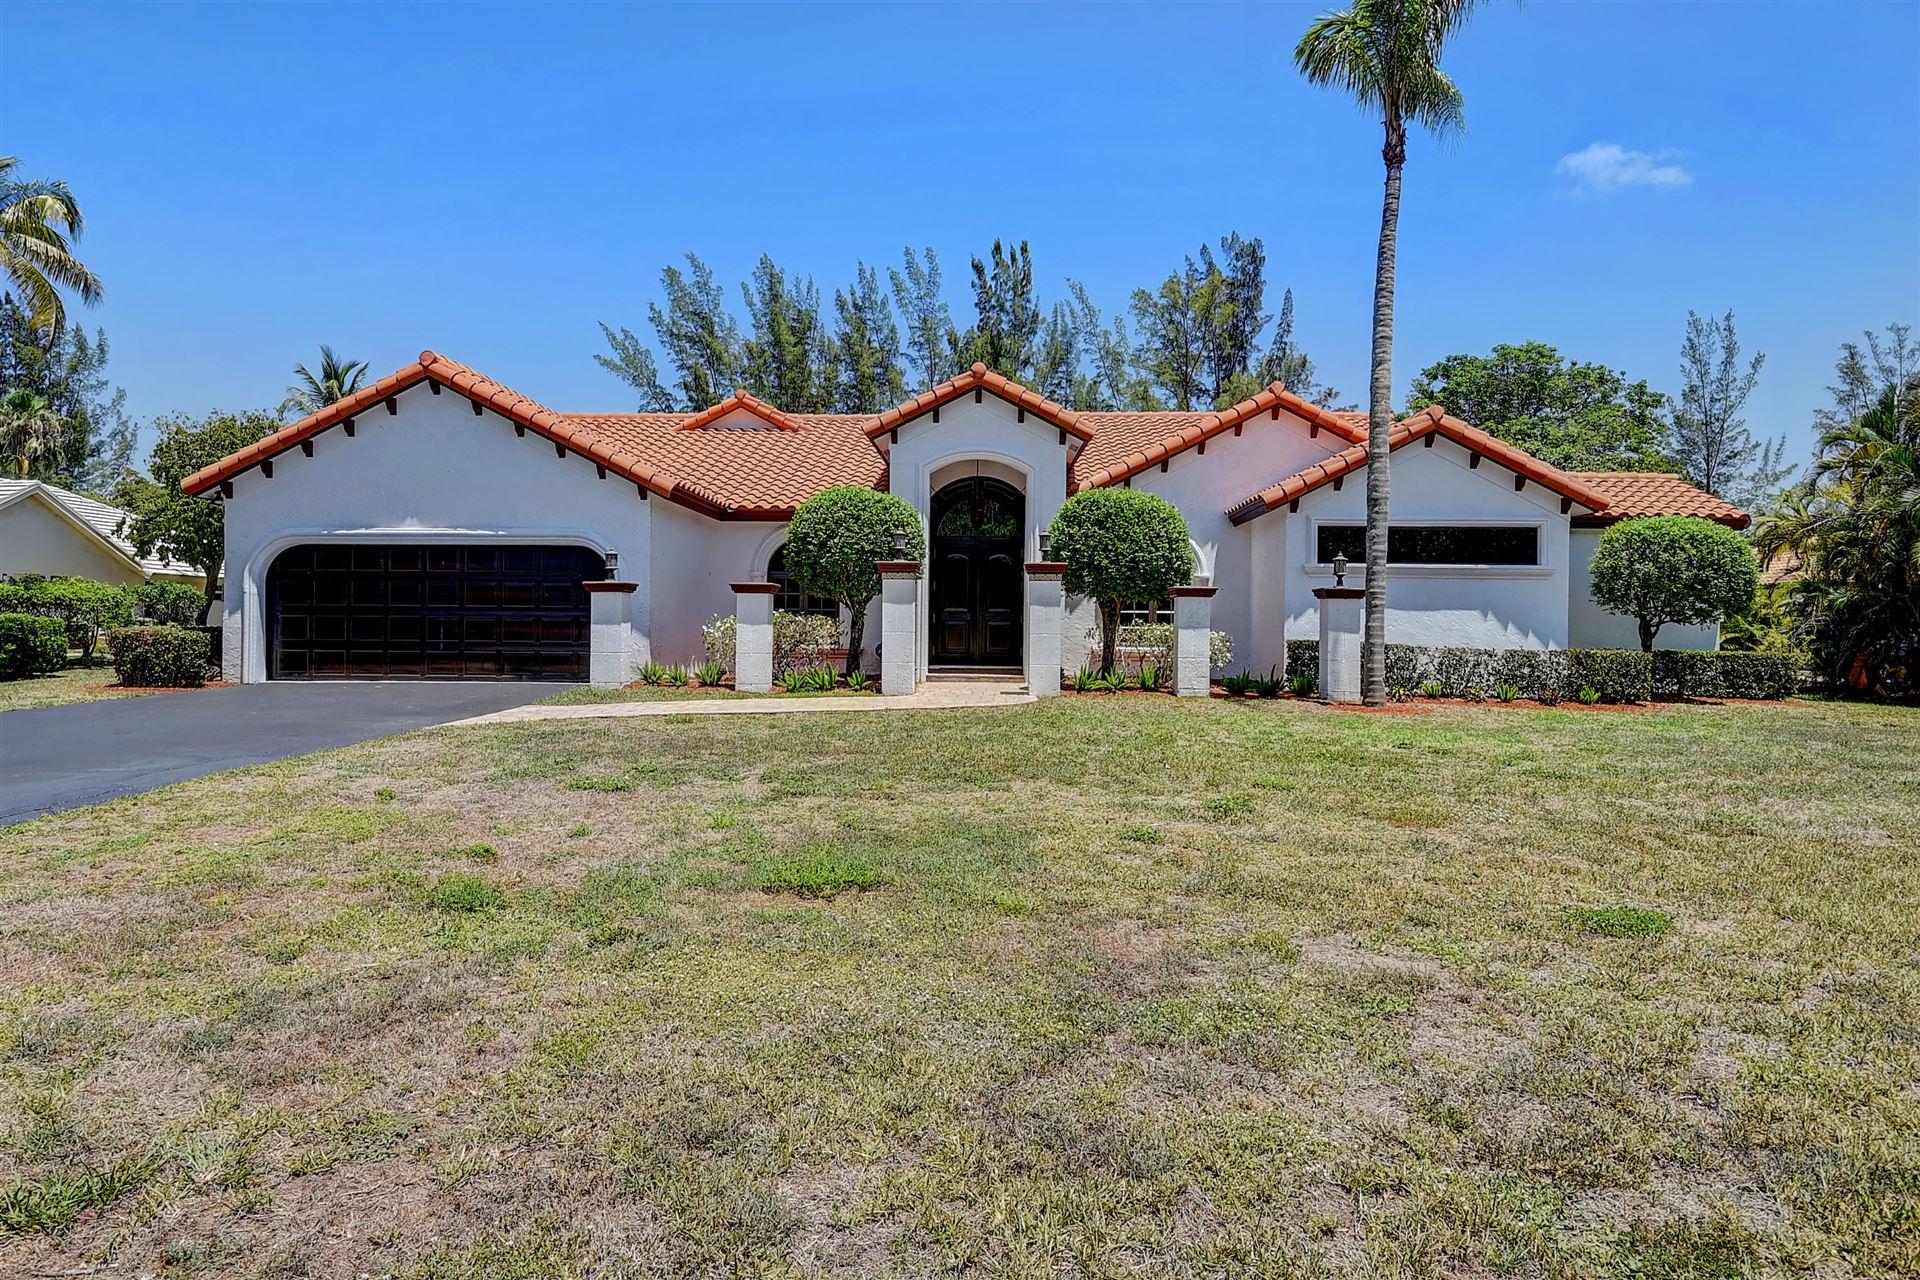 22184 Woodset Lane, Boca Raton, FL 33428 - MLS#: RX-10715345